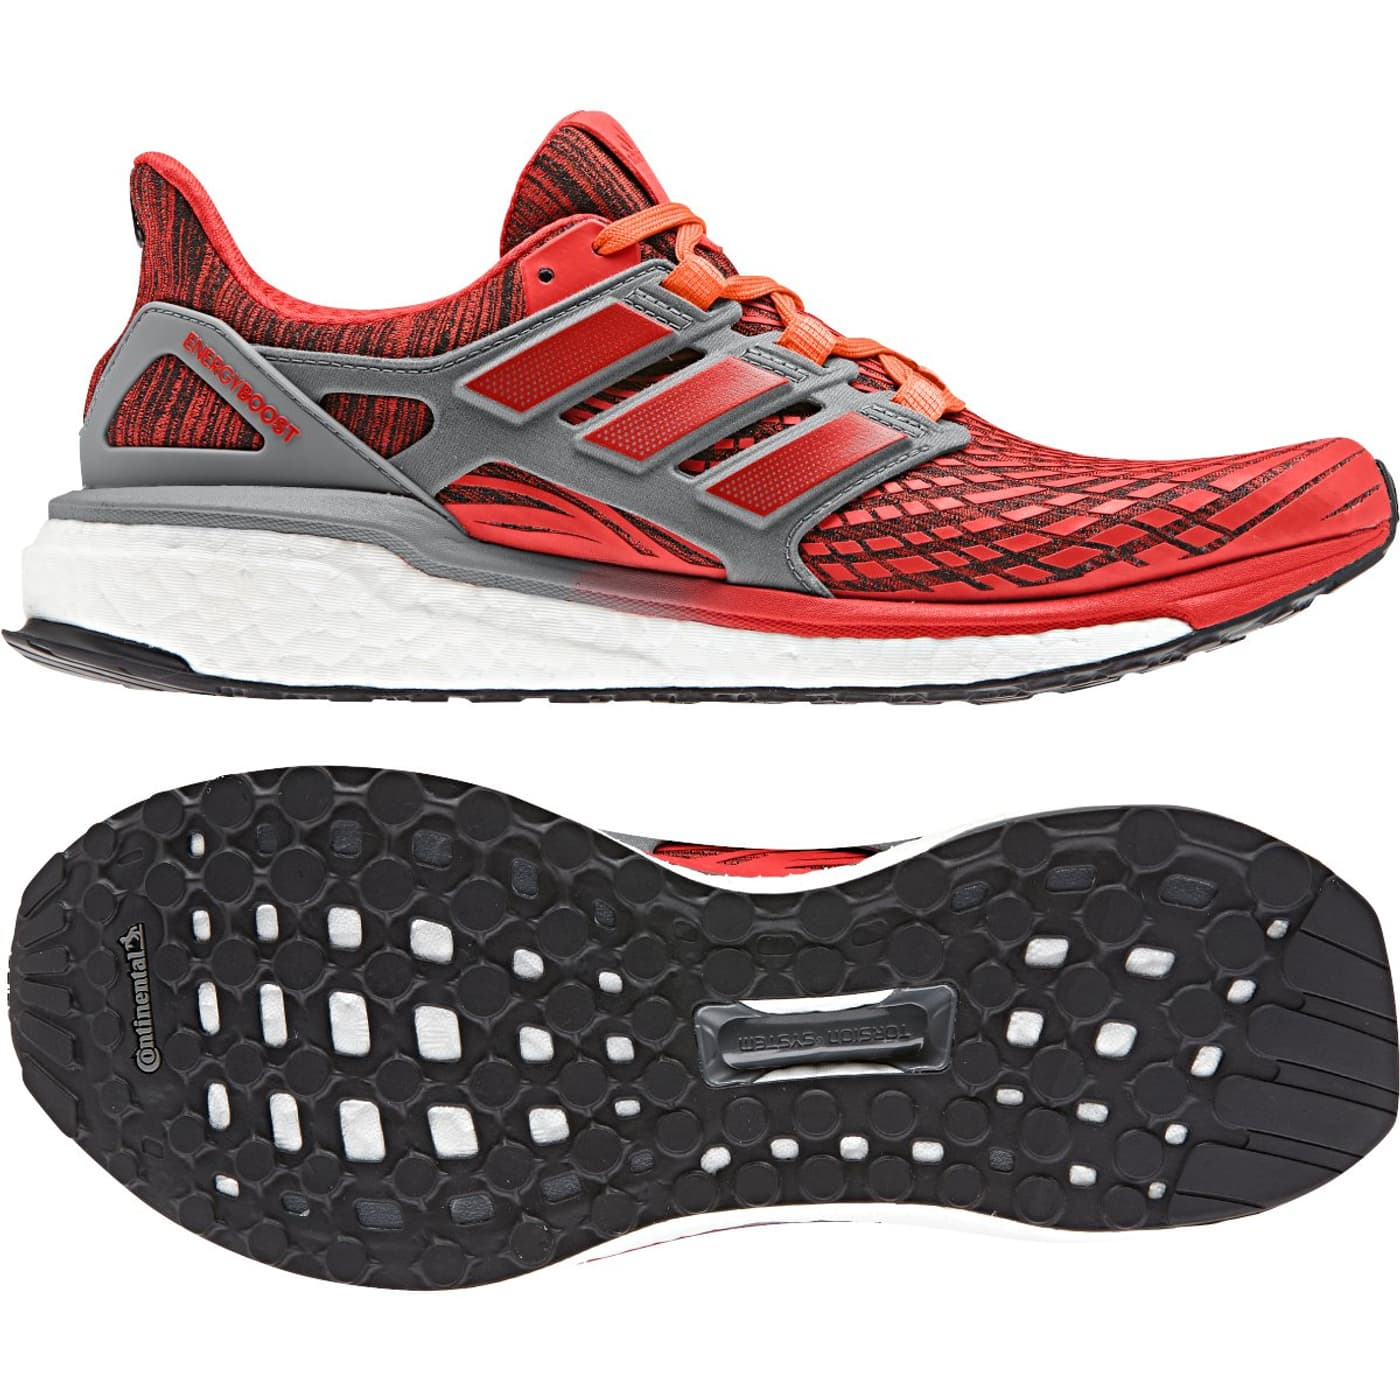 timeless design f1fe6 ca599 ... Adidas Energy Boost 4 Herren-Runningschuh ...